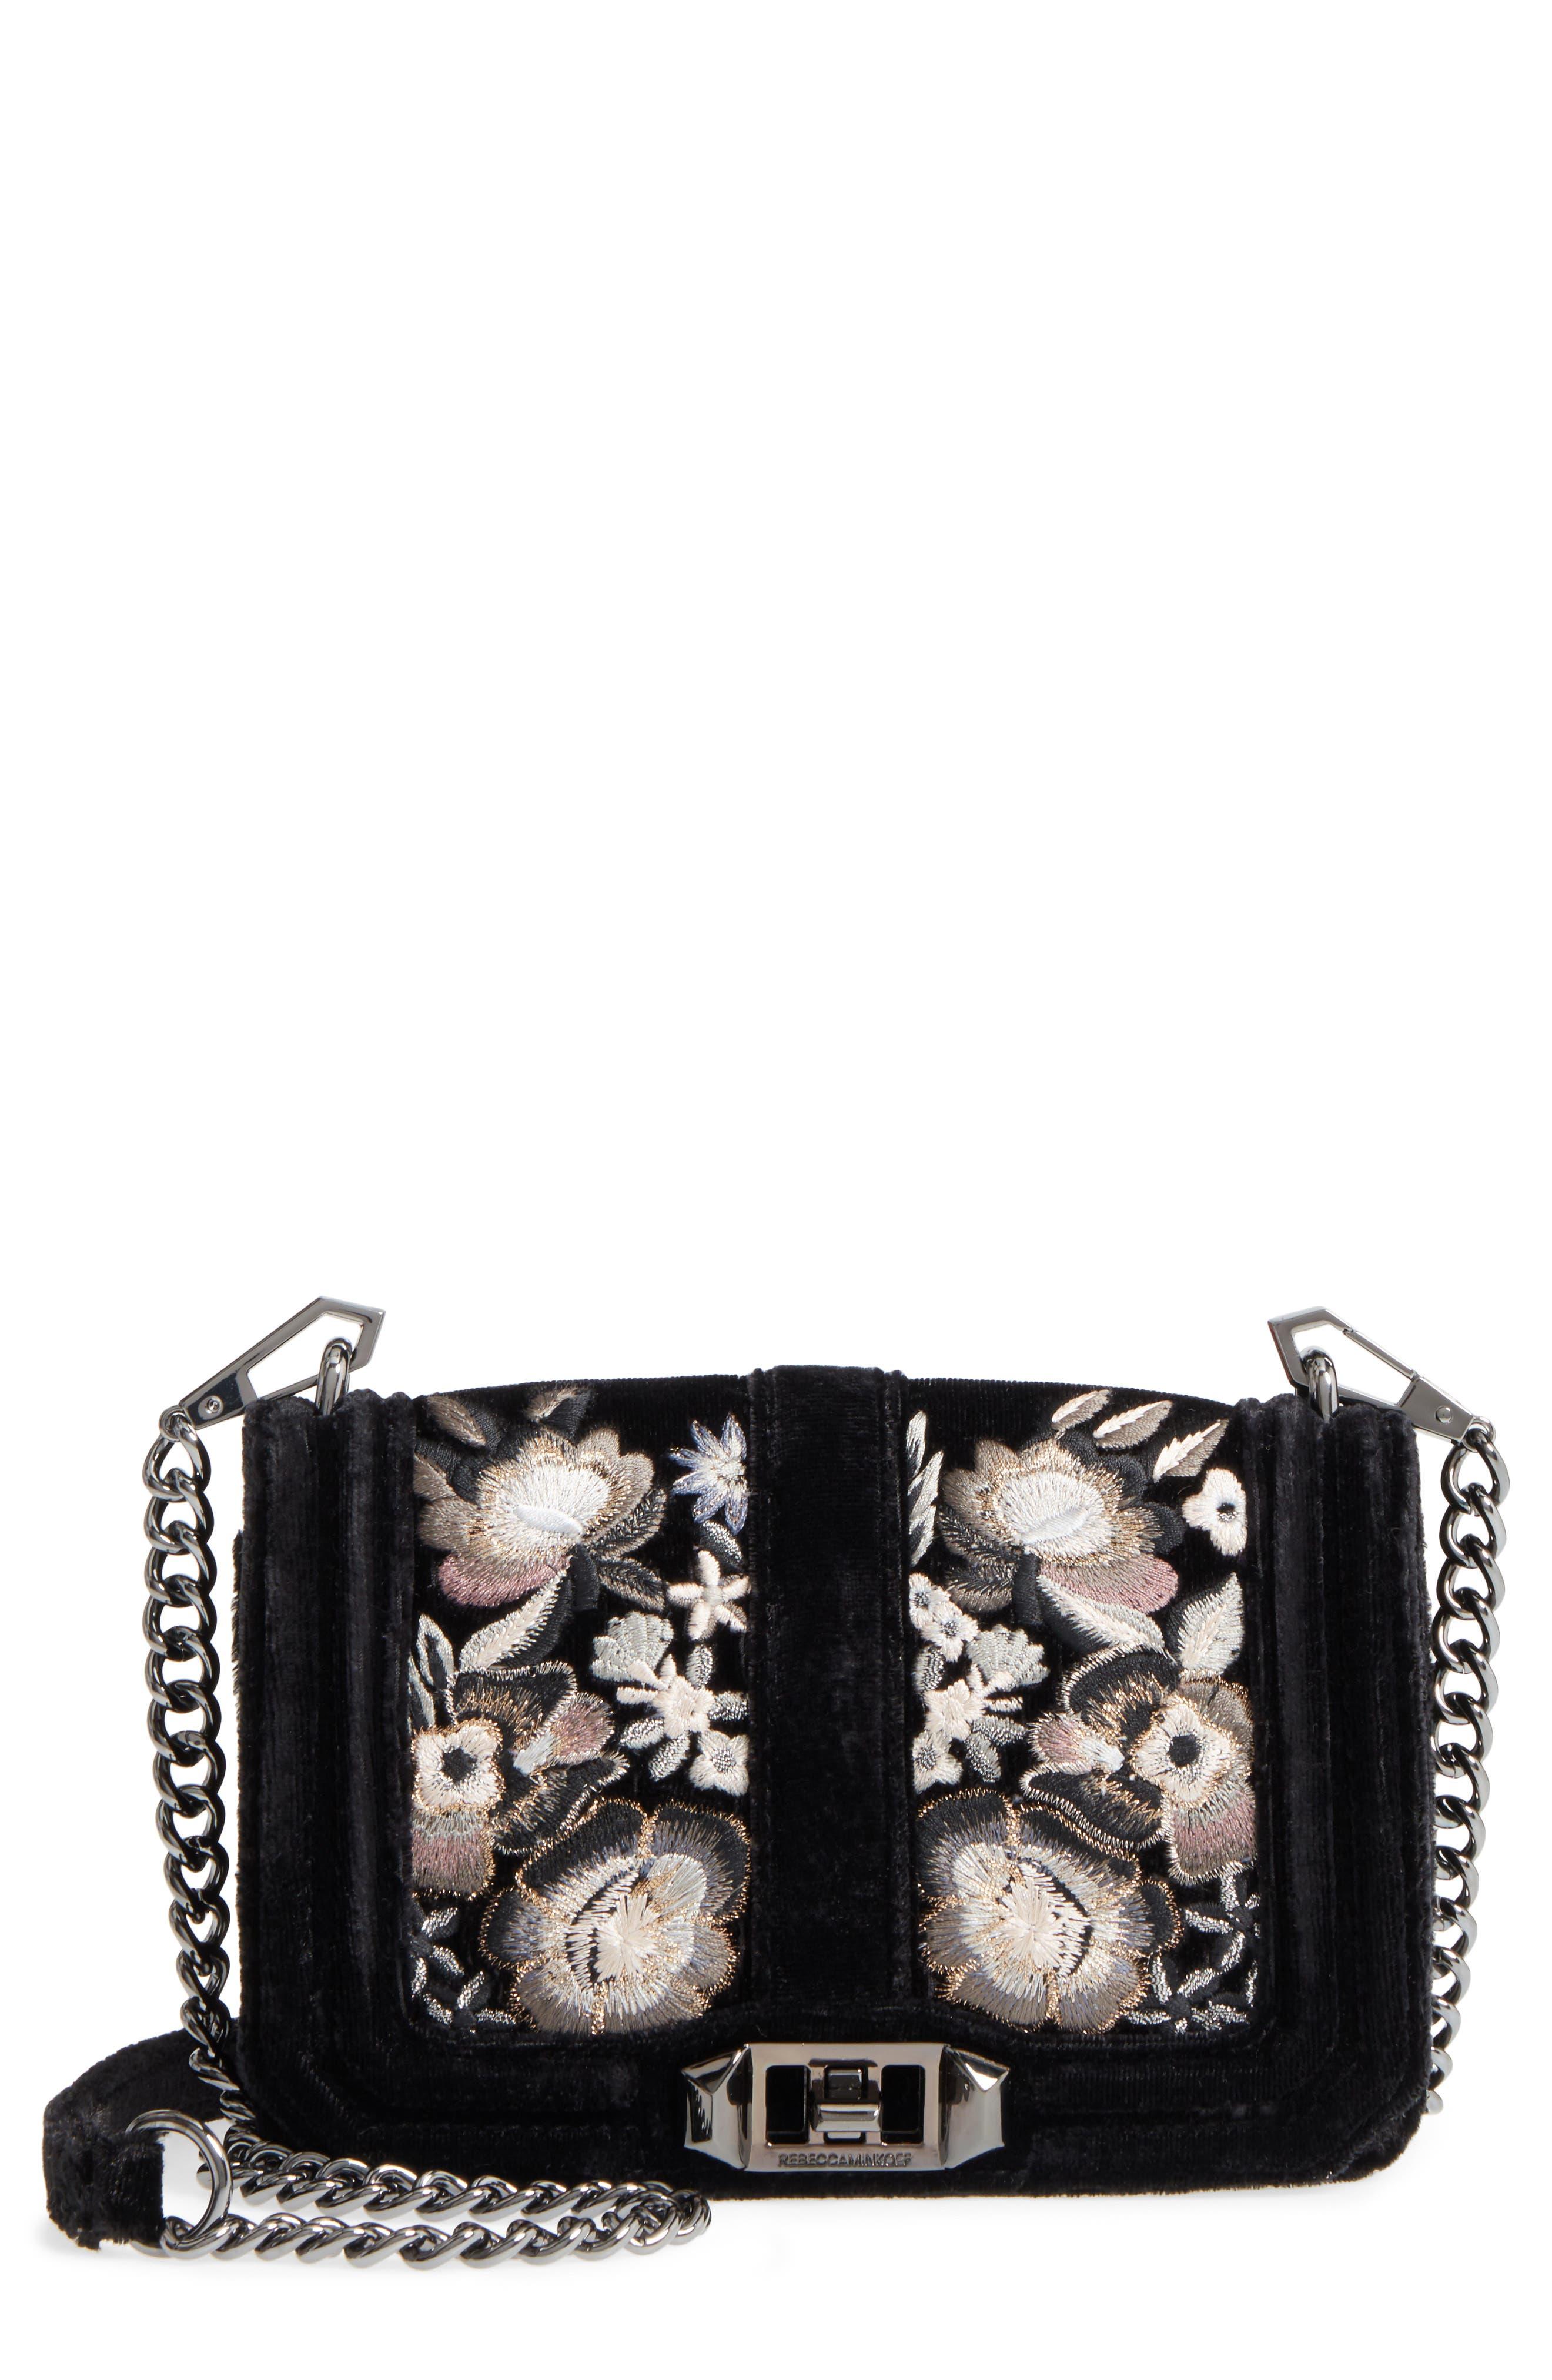 Rebecca Minkoff Small Love Floral Embroidery Velvet Crossbody Bag